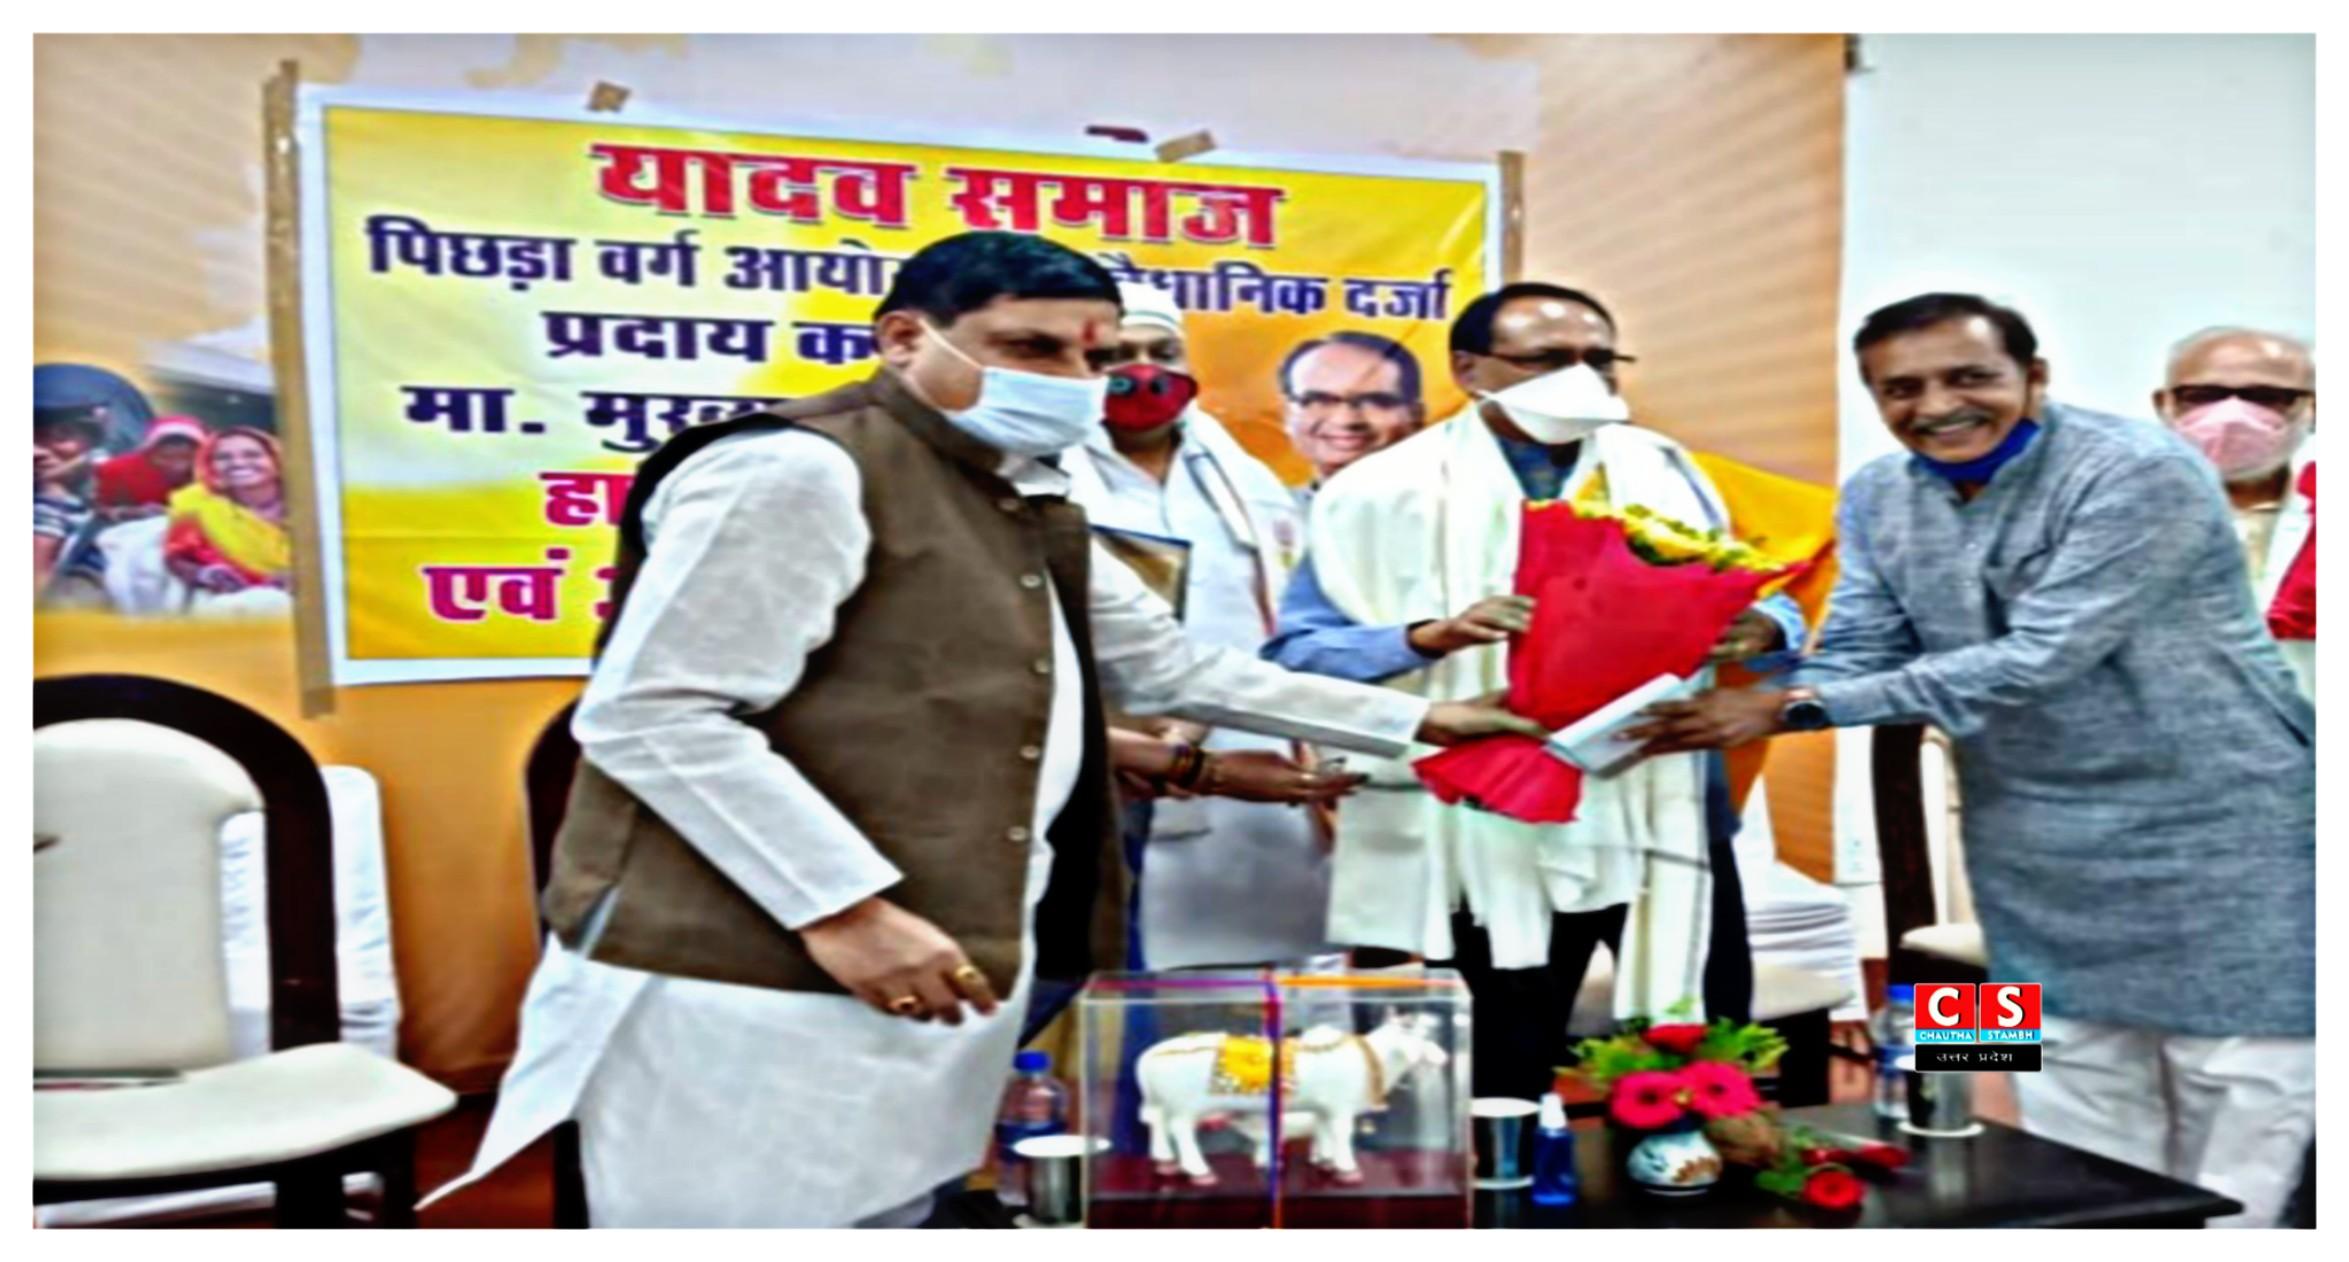 #Shivraj_gave_constitutional_rights_to_Backward_Classes_Commission_CHAUTHA_STAMBH_News_UttarPradesh